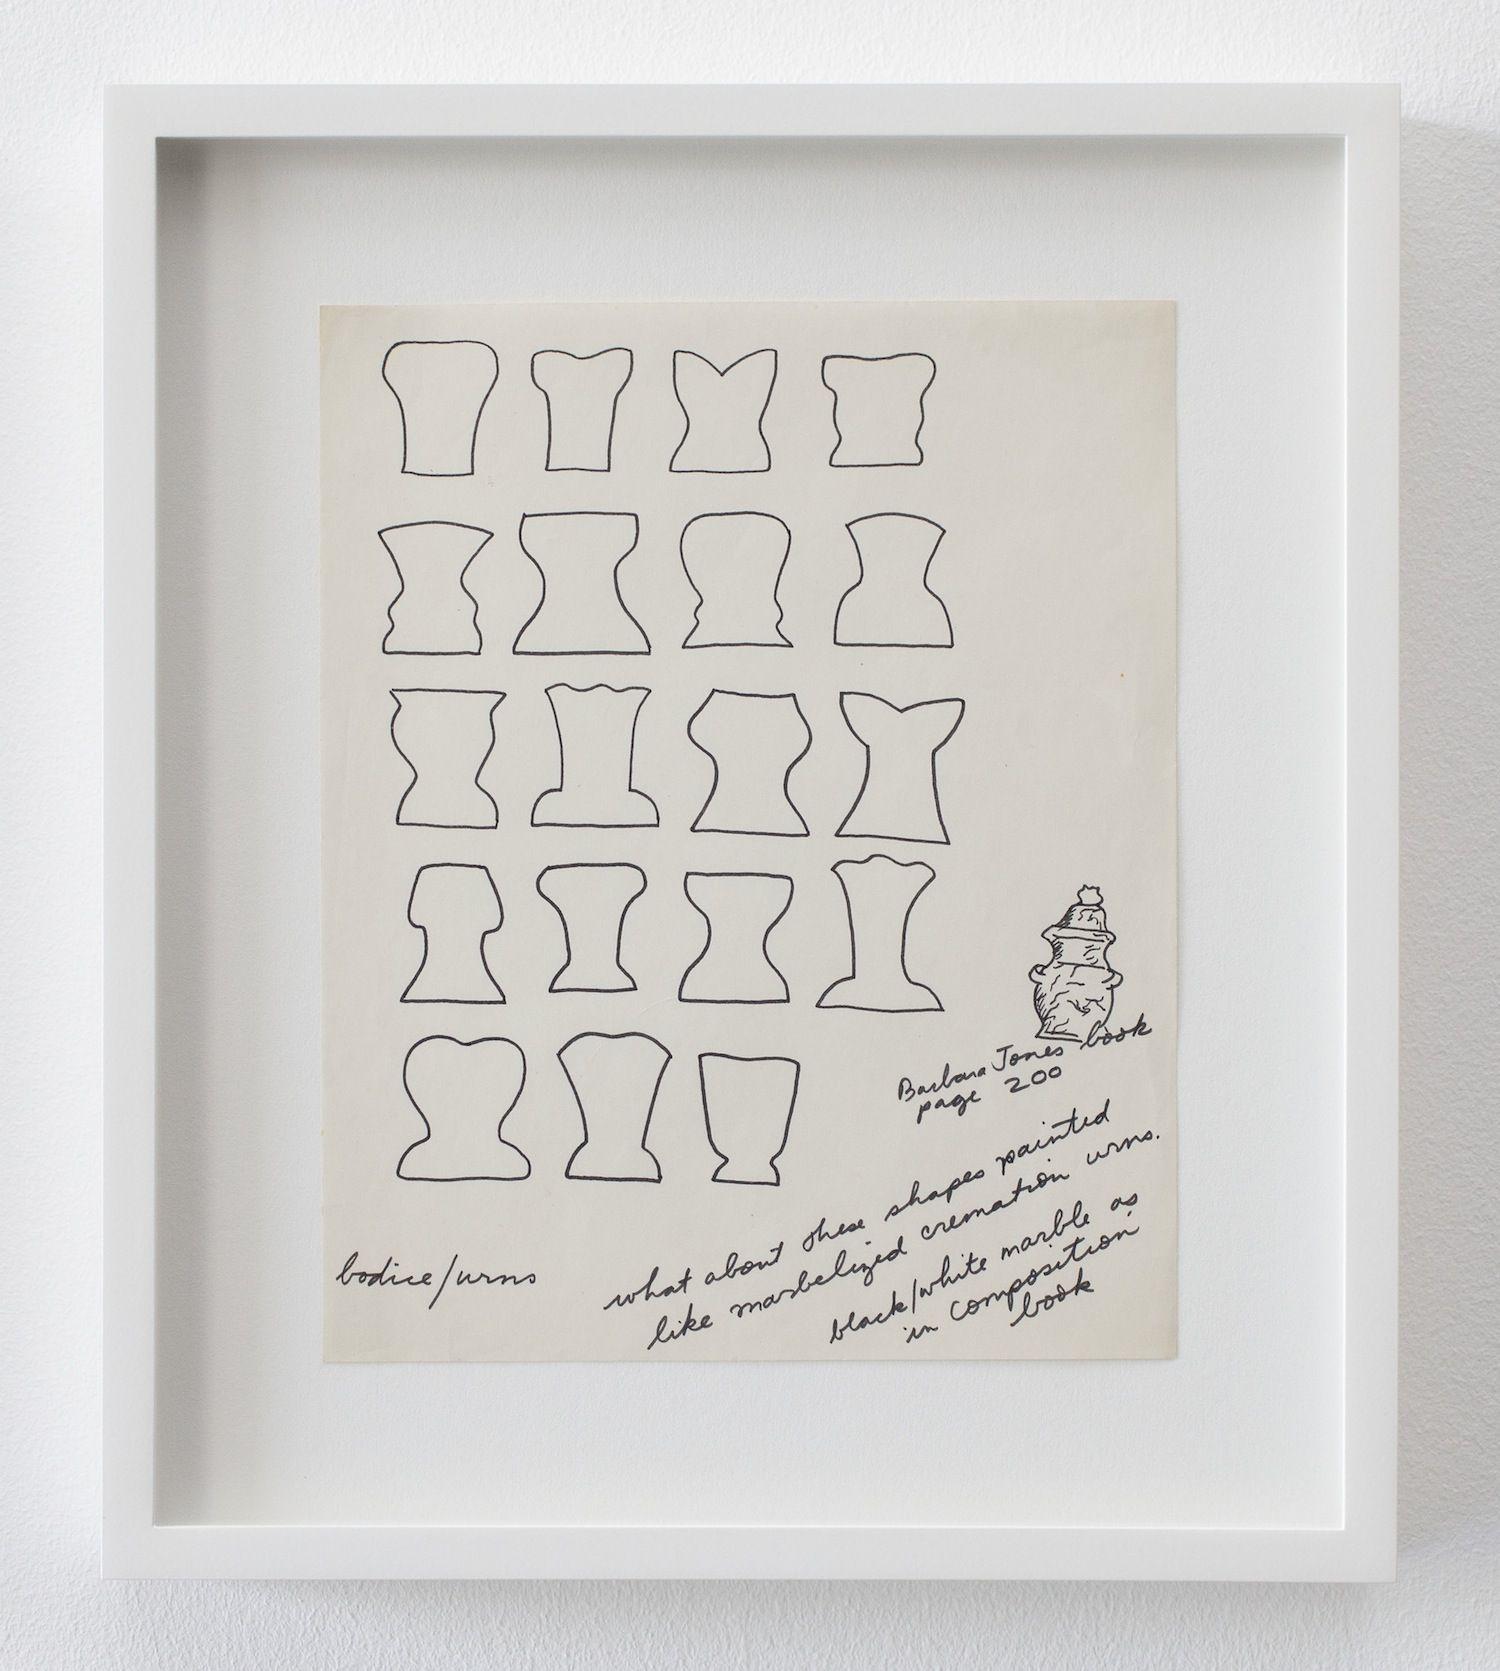 Christina Ramberg,, Untitled (Bodice/Urns), N.D.